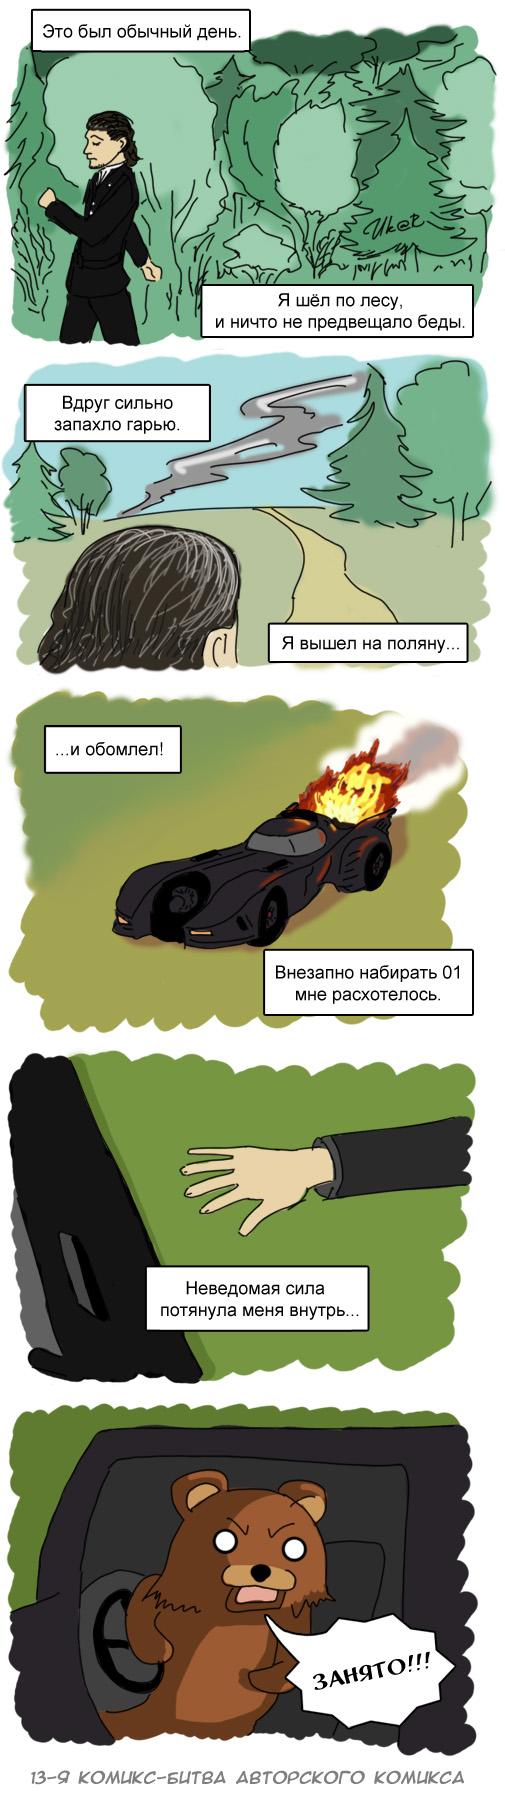 Комикс-битва №13 выпуск 164